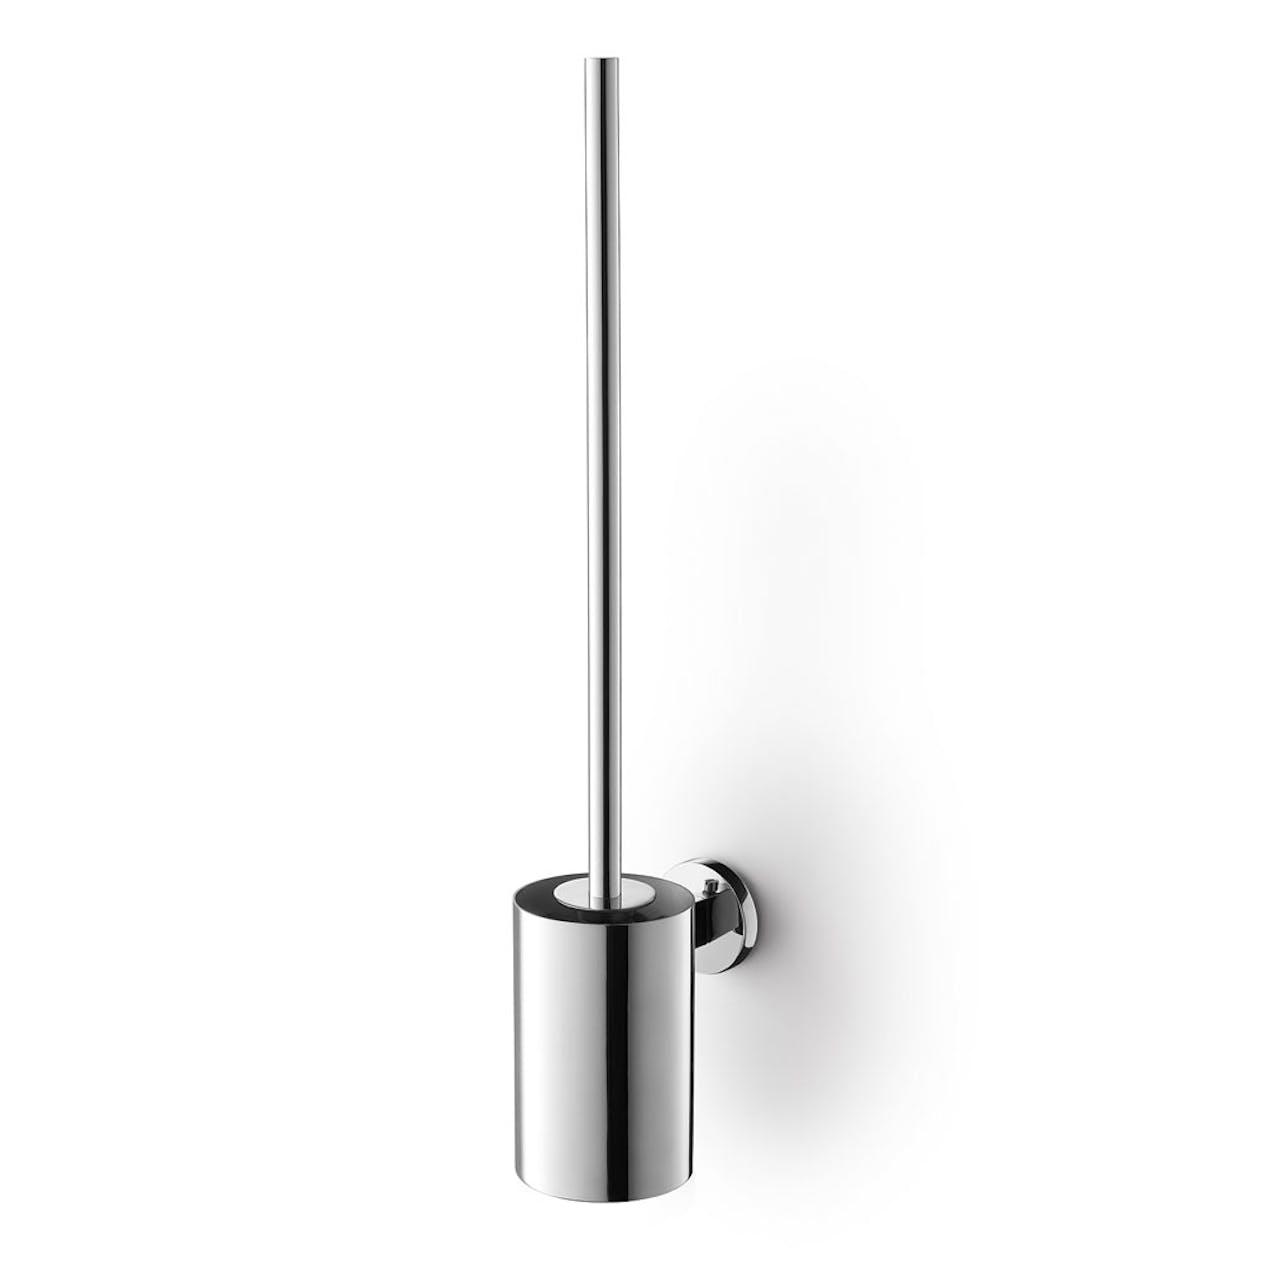 Attraktiva Toalettborste Vägg Zack Scala till bra pris hos Badshop.se EB-94